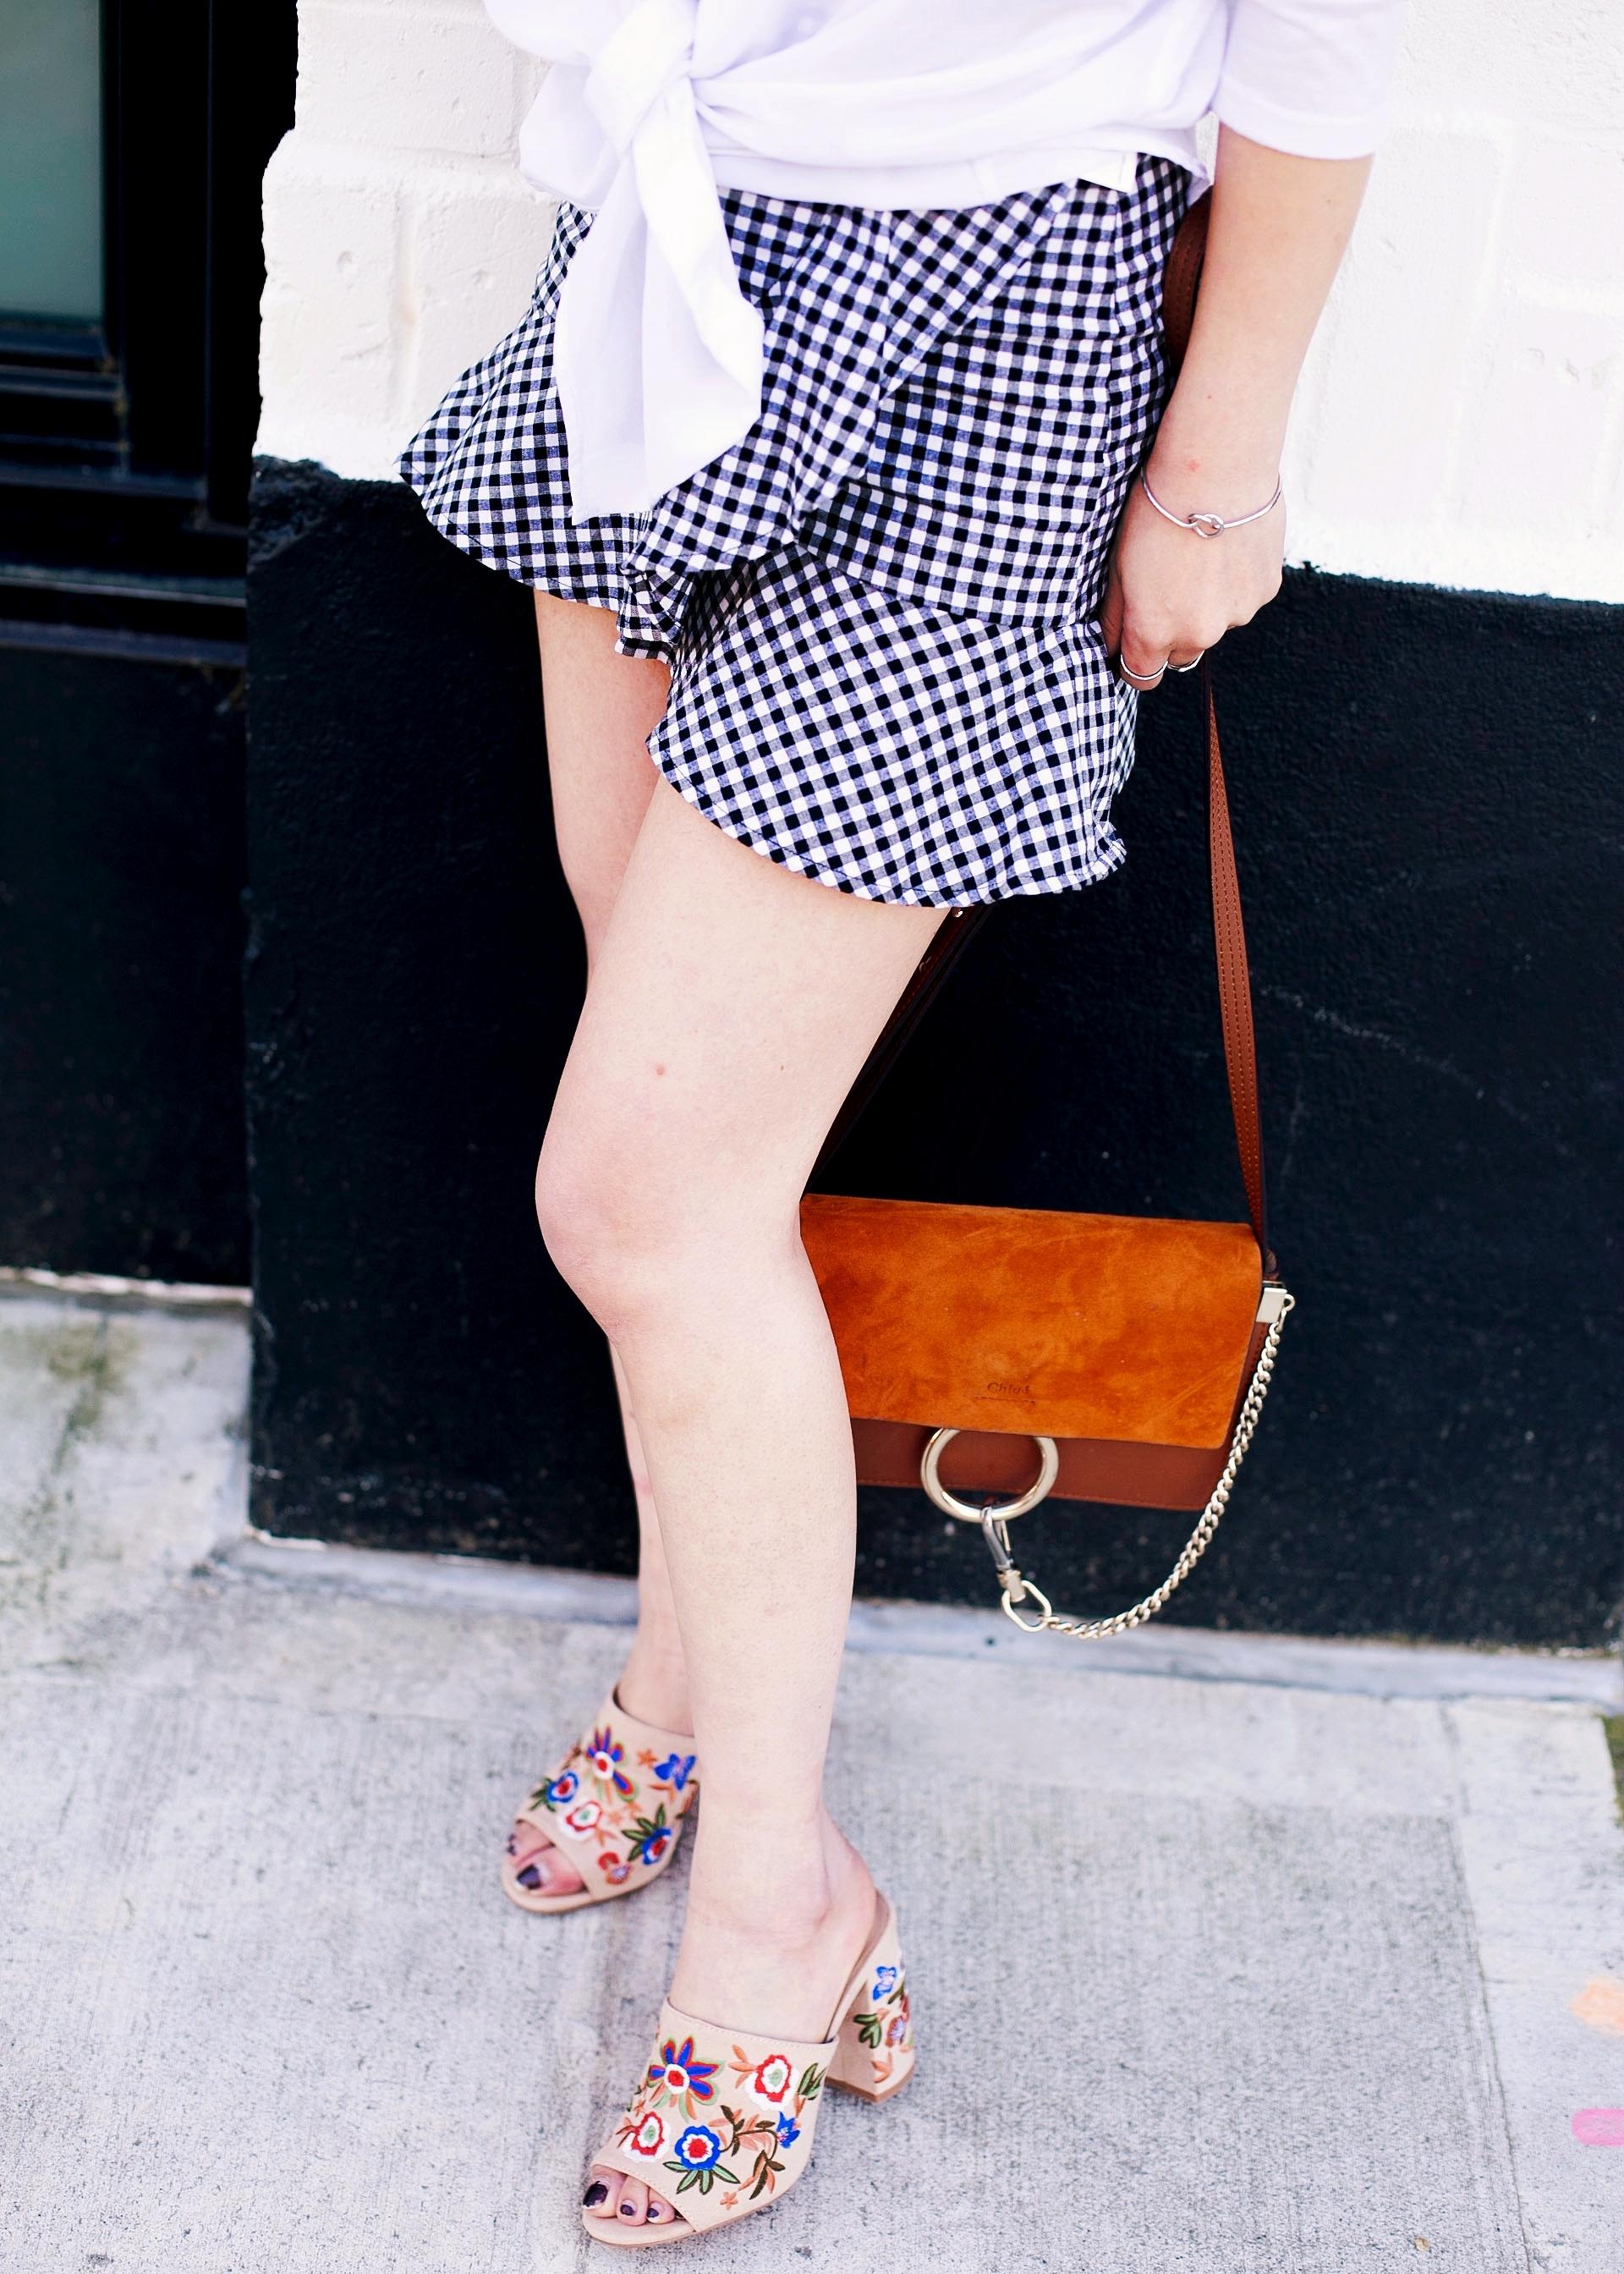 H&M Gingham Mini skirt_Chloe Faye mini bag_Aldo Embroidered mules_Aikas Love Closet_Seattle Fashion style blogger_Petite fashion